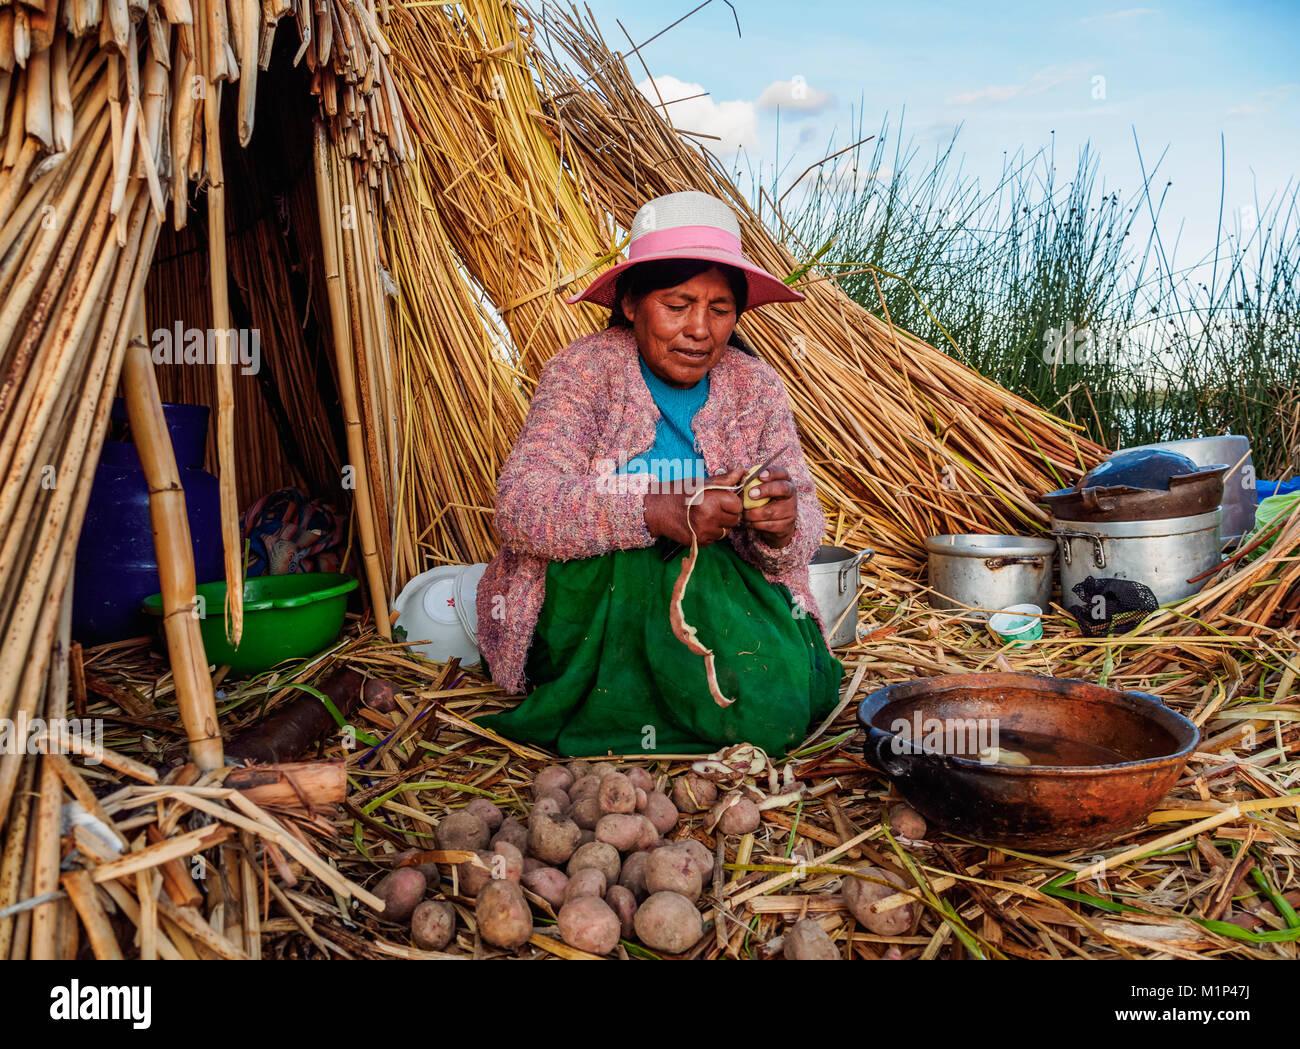 Native Uro Lady cooking, Uros Floating Islands, Lake Titicaca, Puno Region, Peru, South America - Stock Image